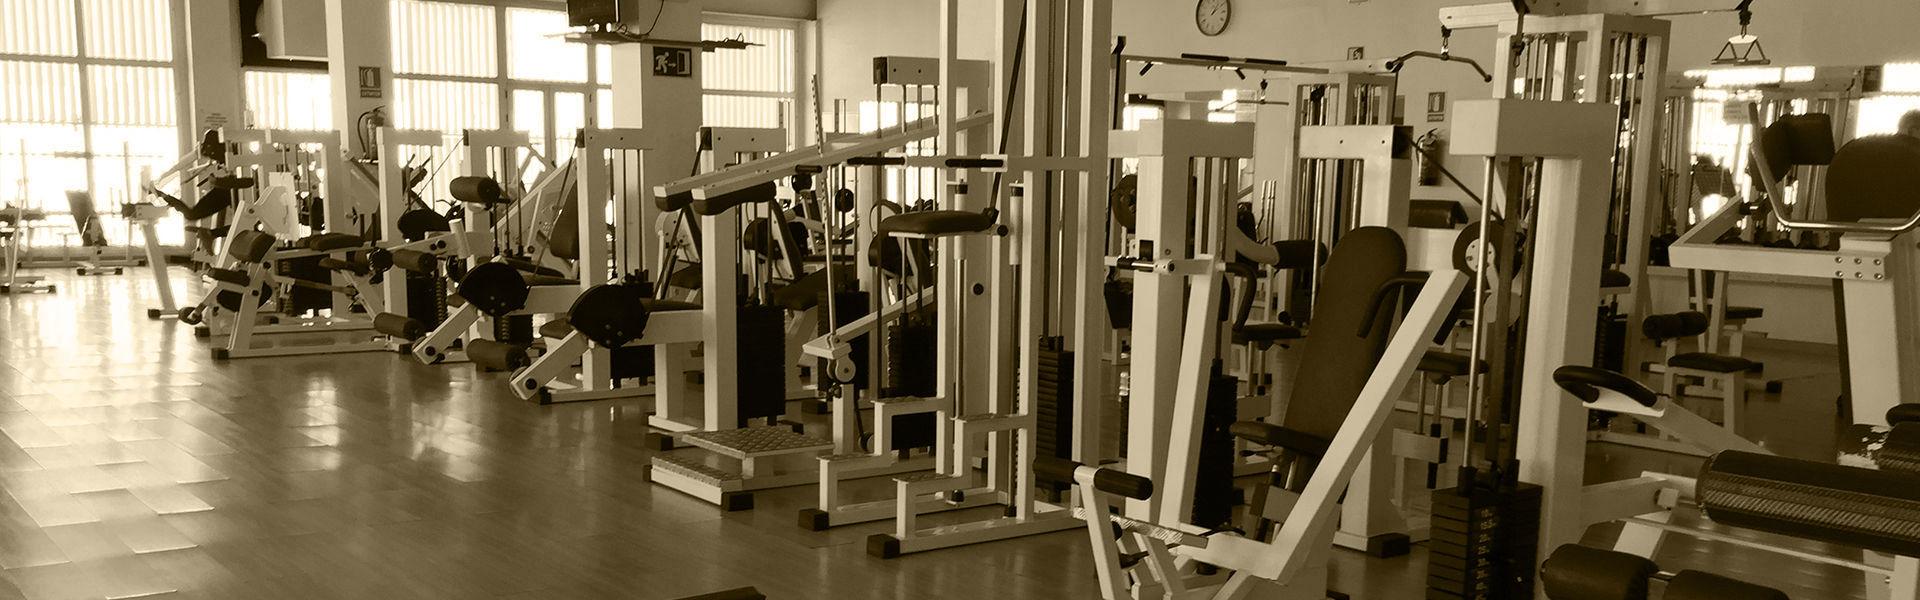 Gimnasio vigor tu gimnasio de confianza en san fernando for Tu gimnasio